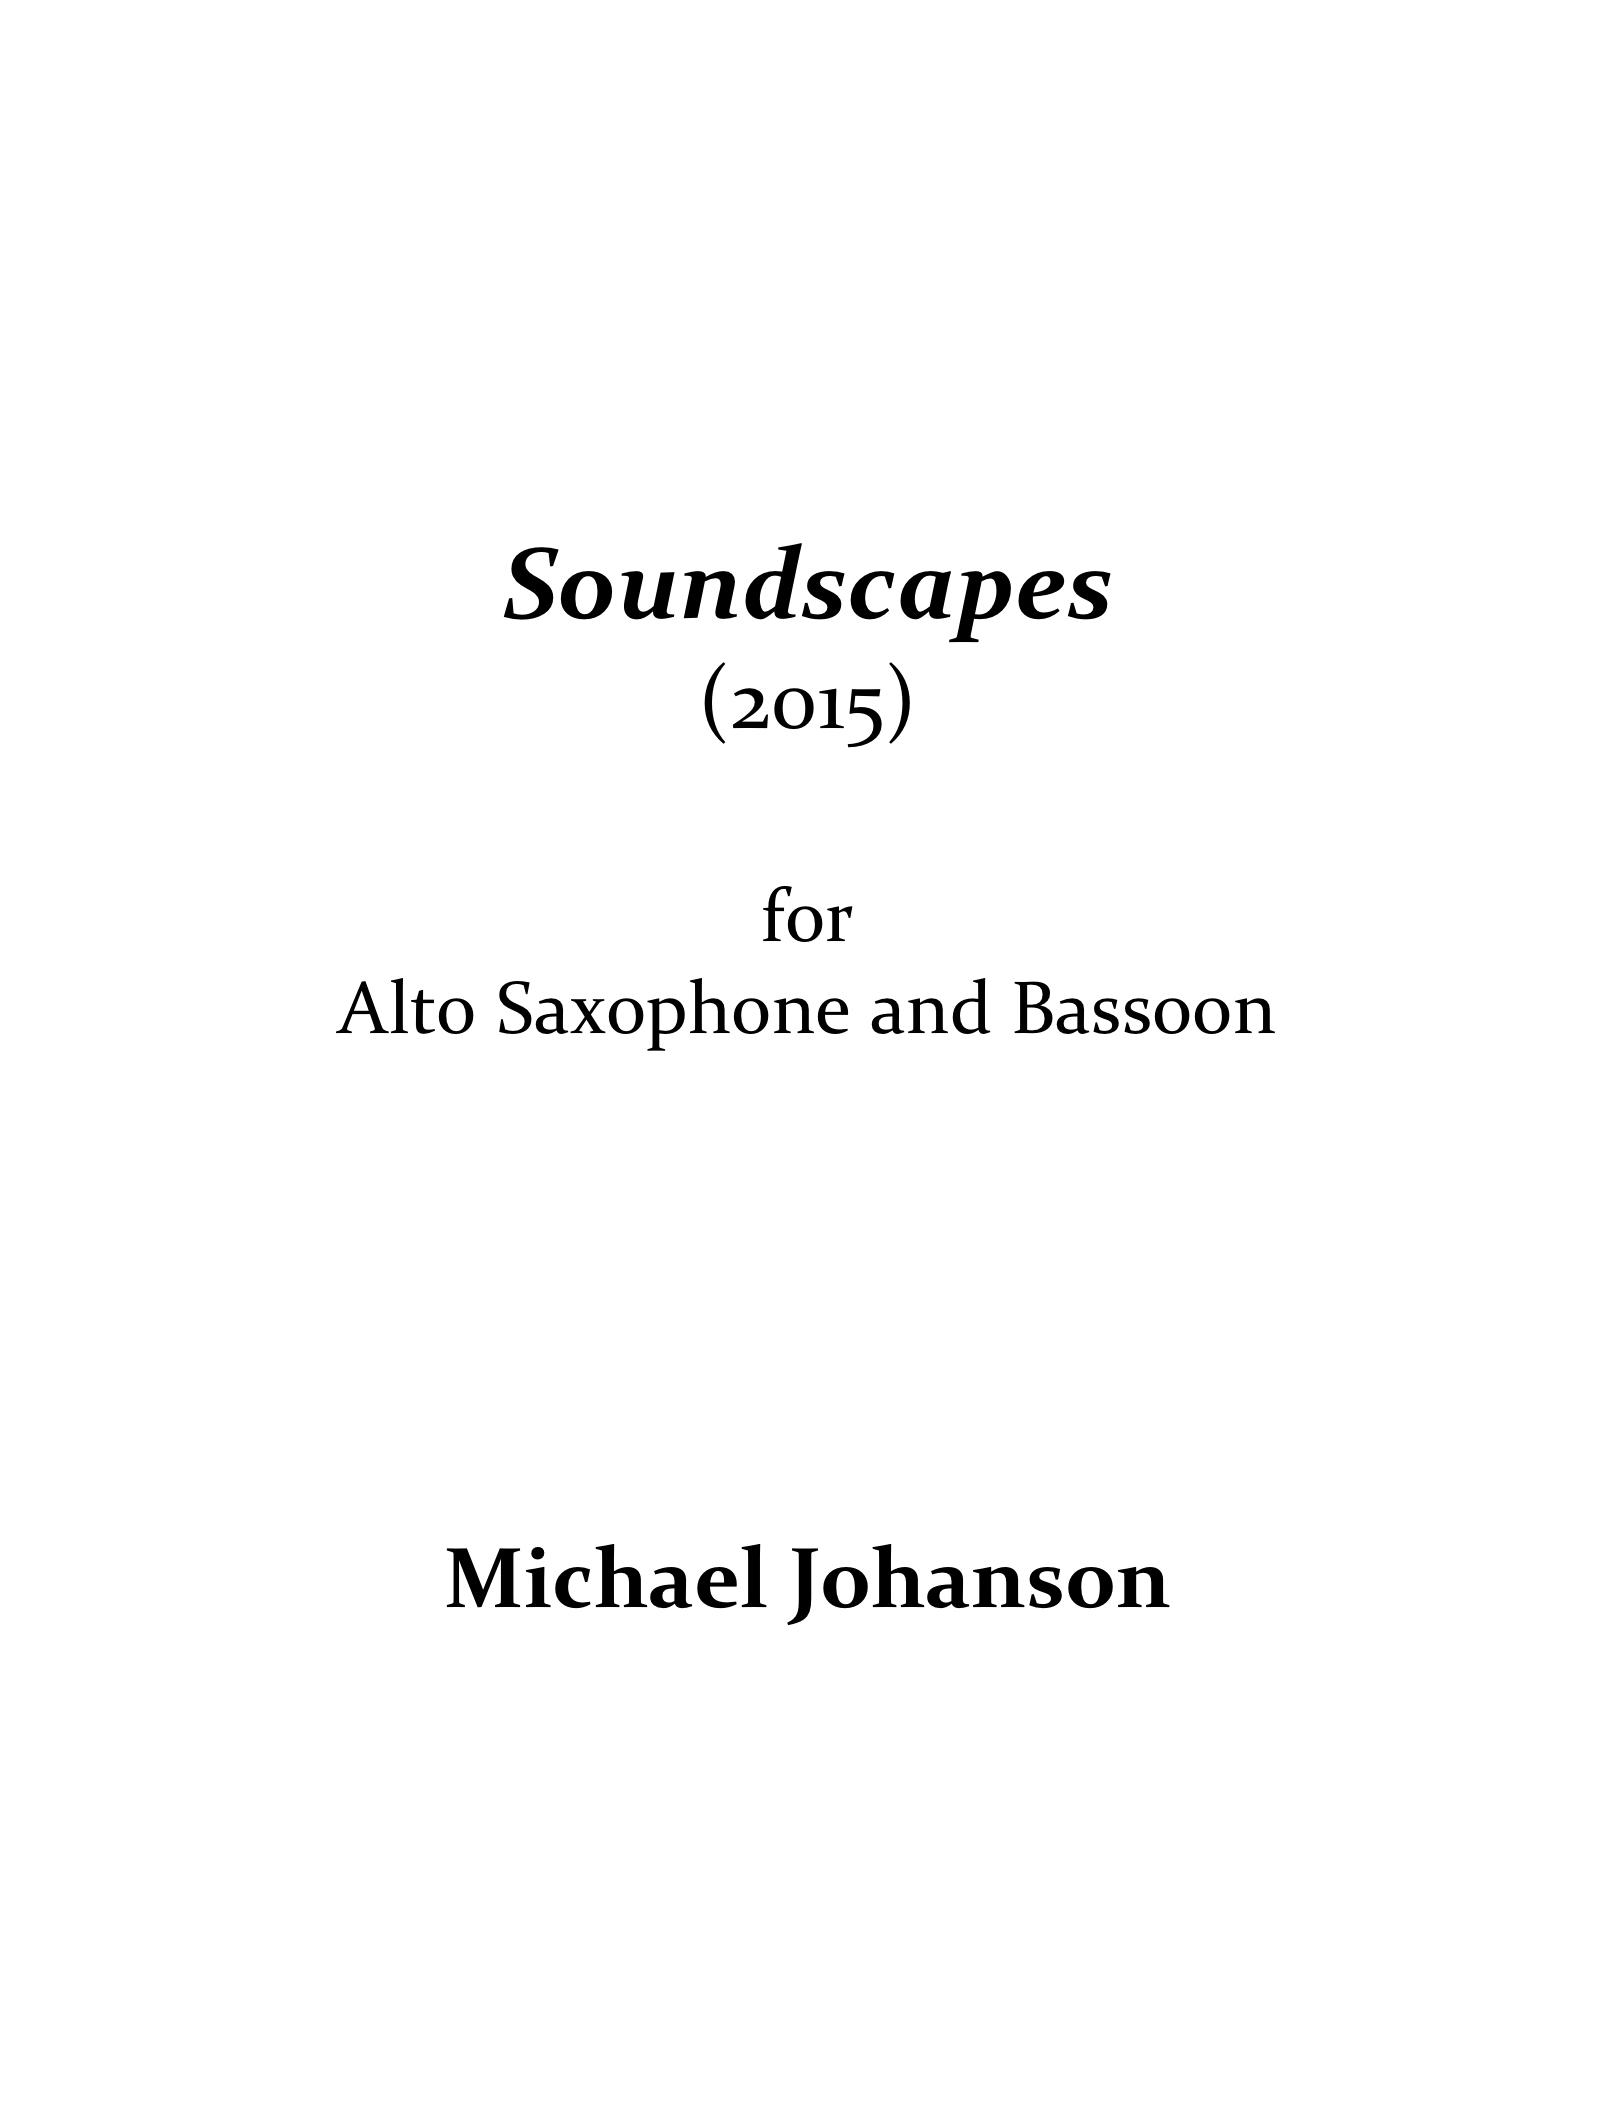 Soundscapes  by Michael Johanson